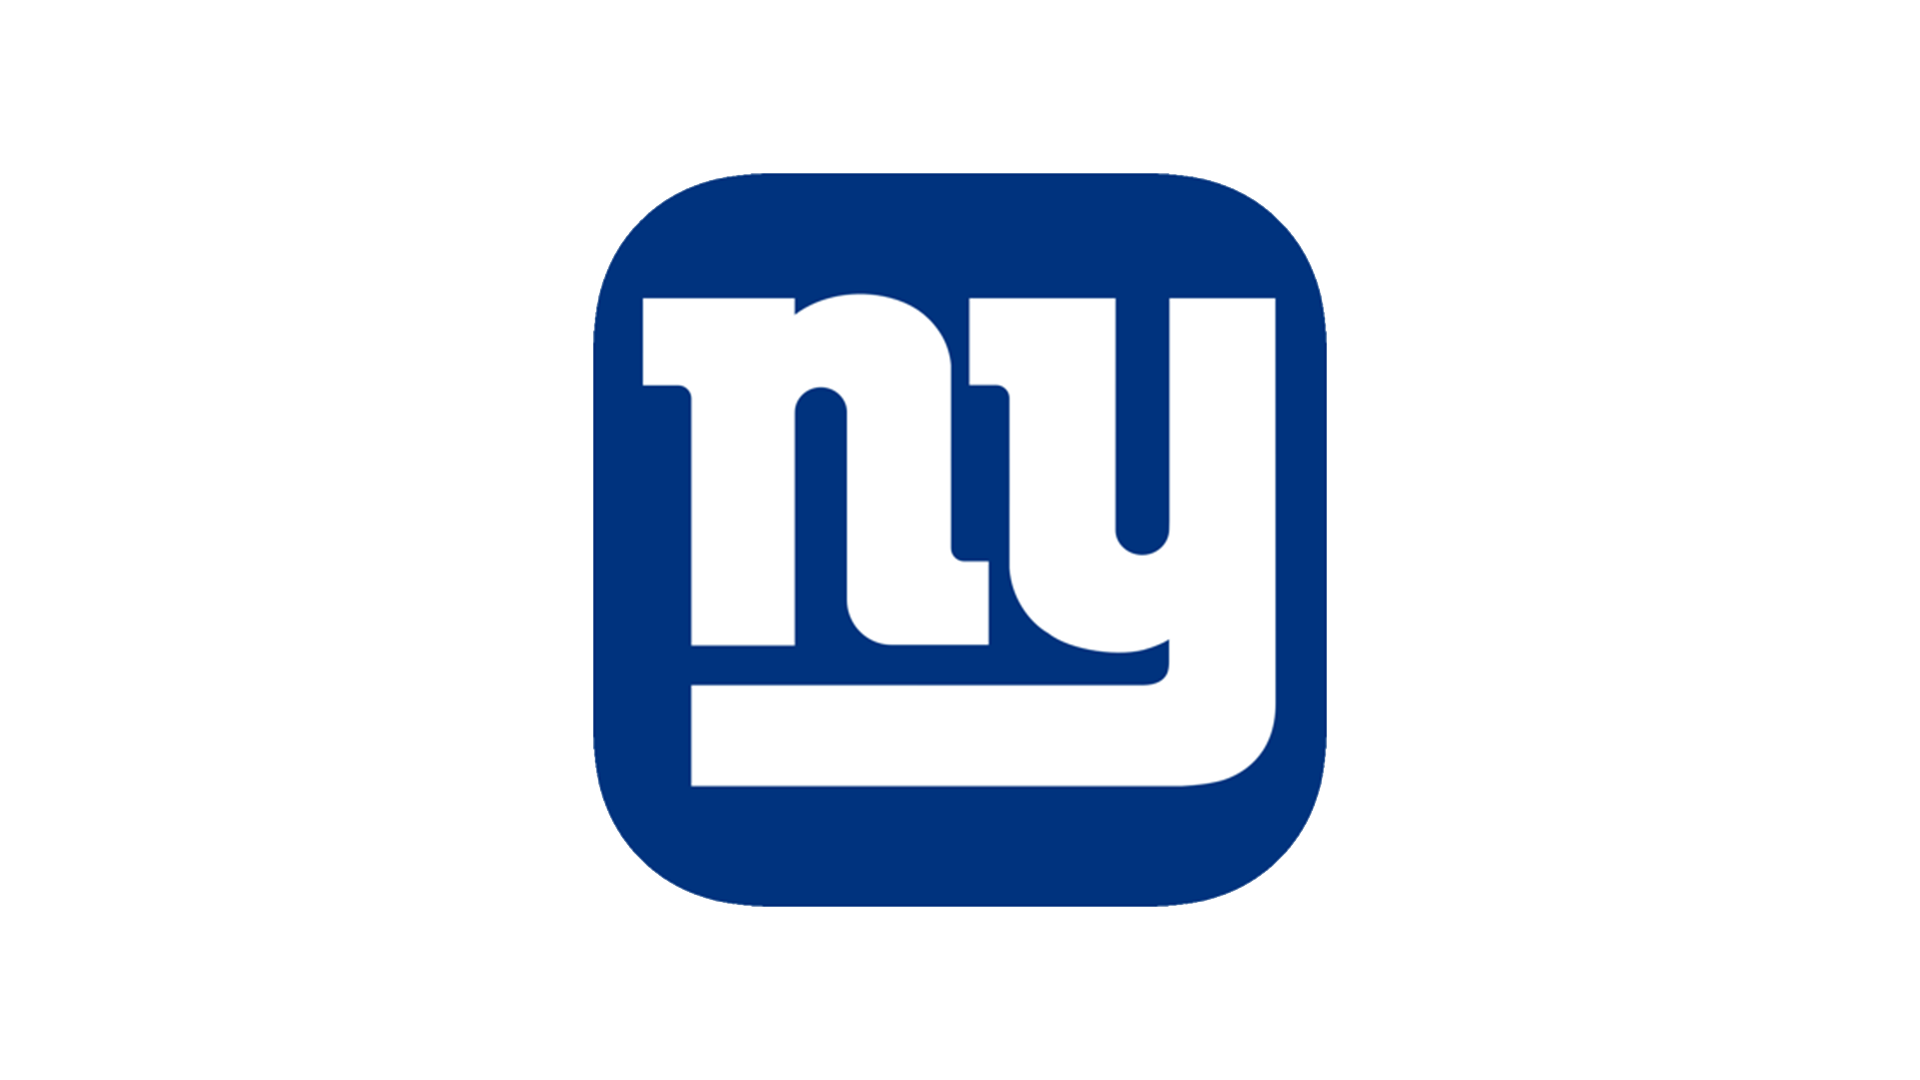 Giants App